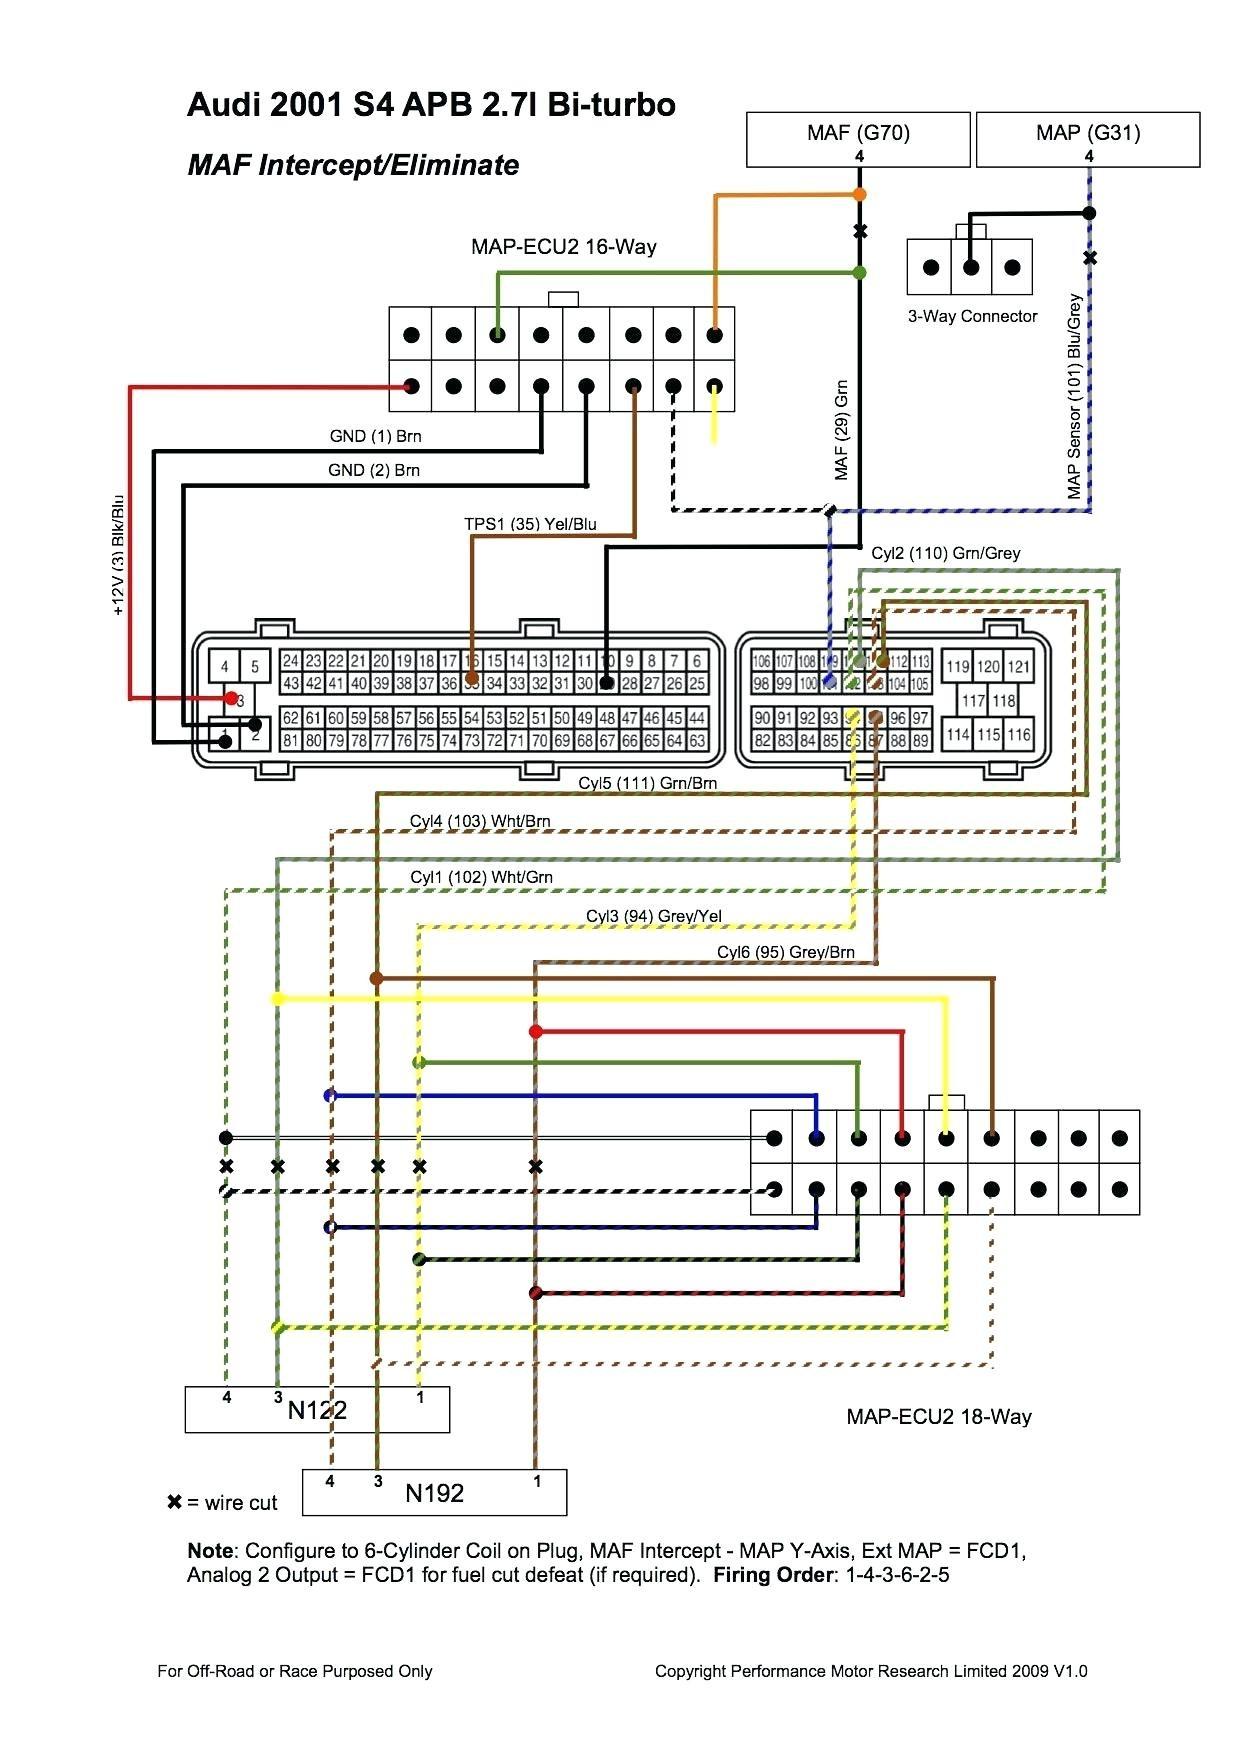 1991 Honda Accord Wiring Diagram Dodge Durango Stereo Wiring Diagram 2000  Radio Factory Headlight Of 1991